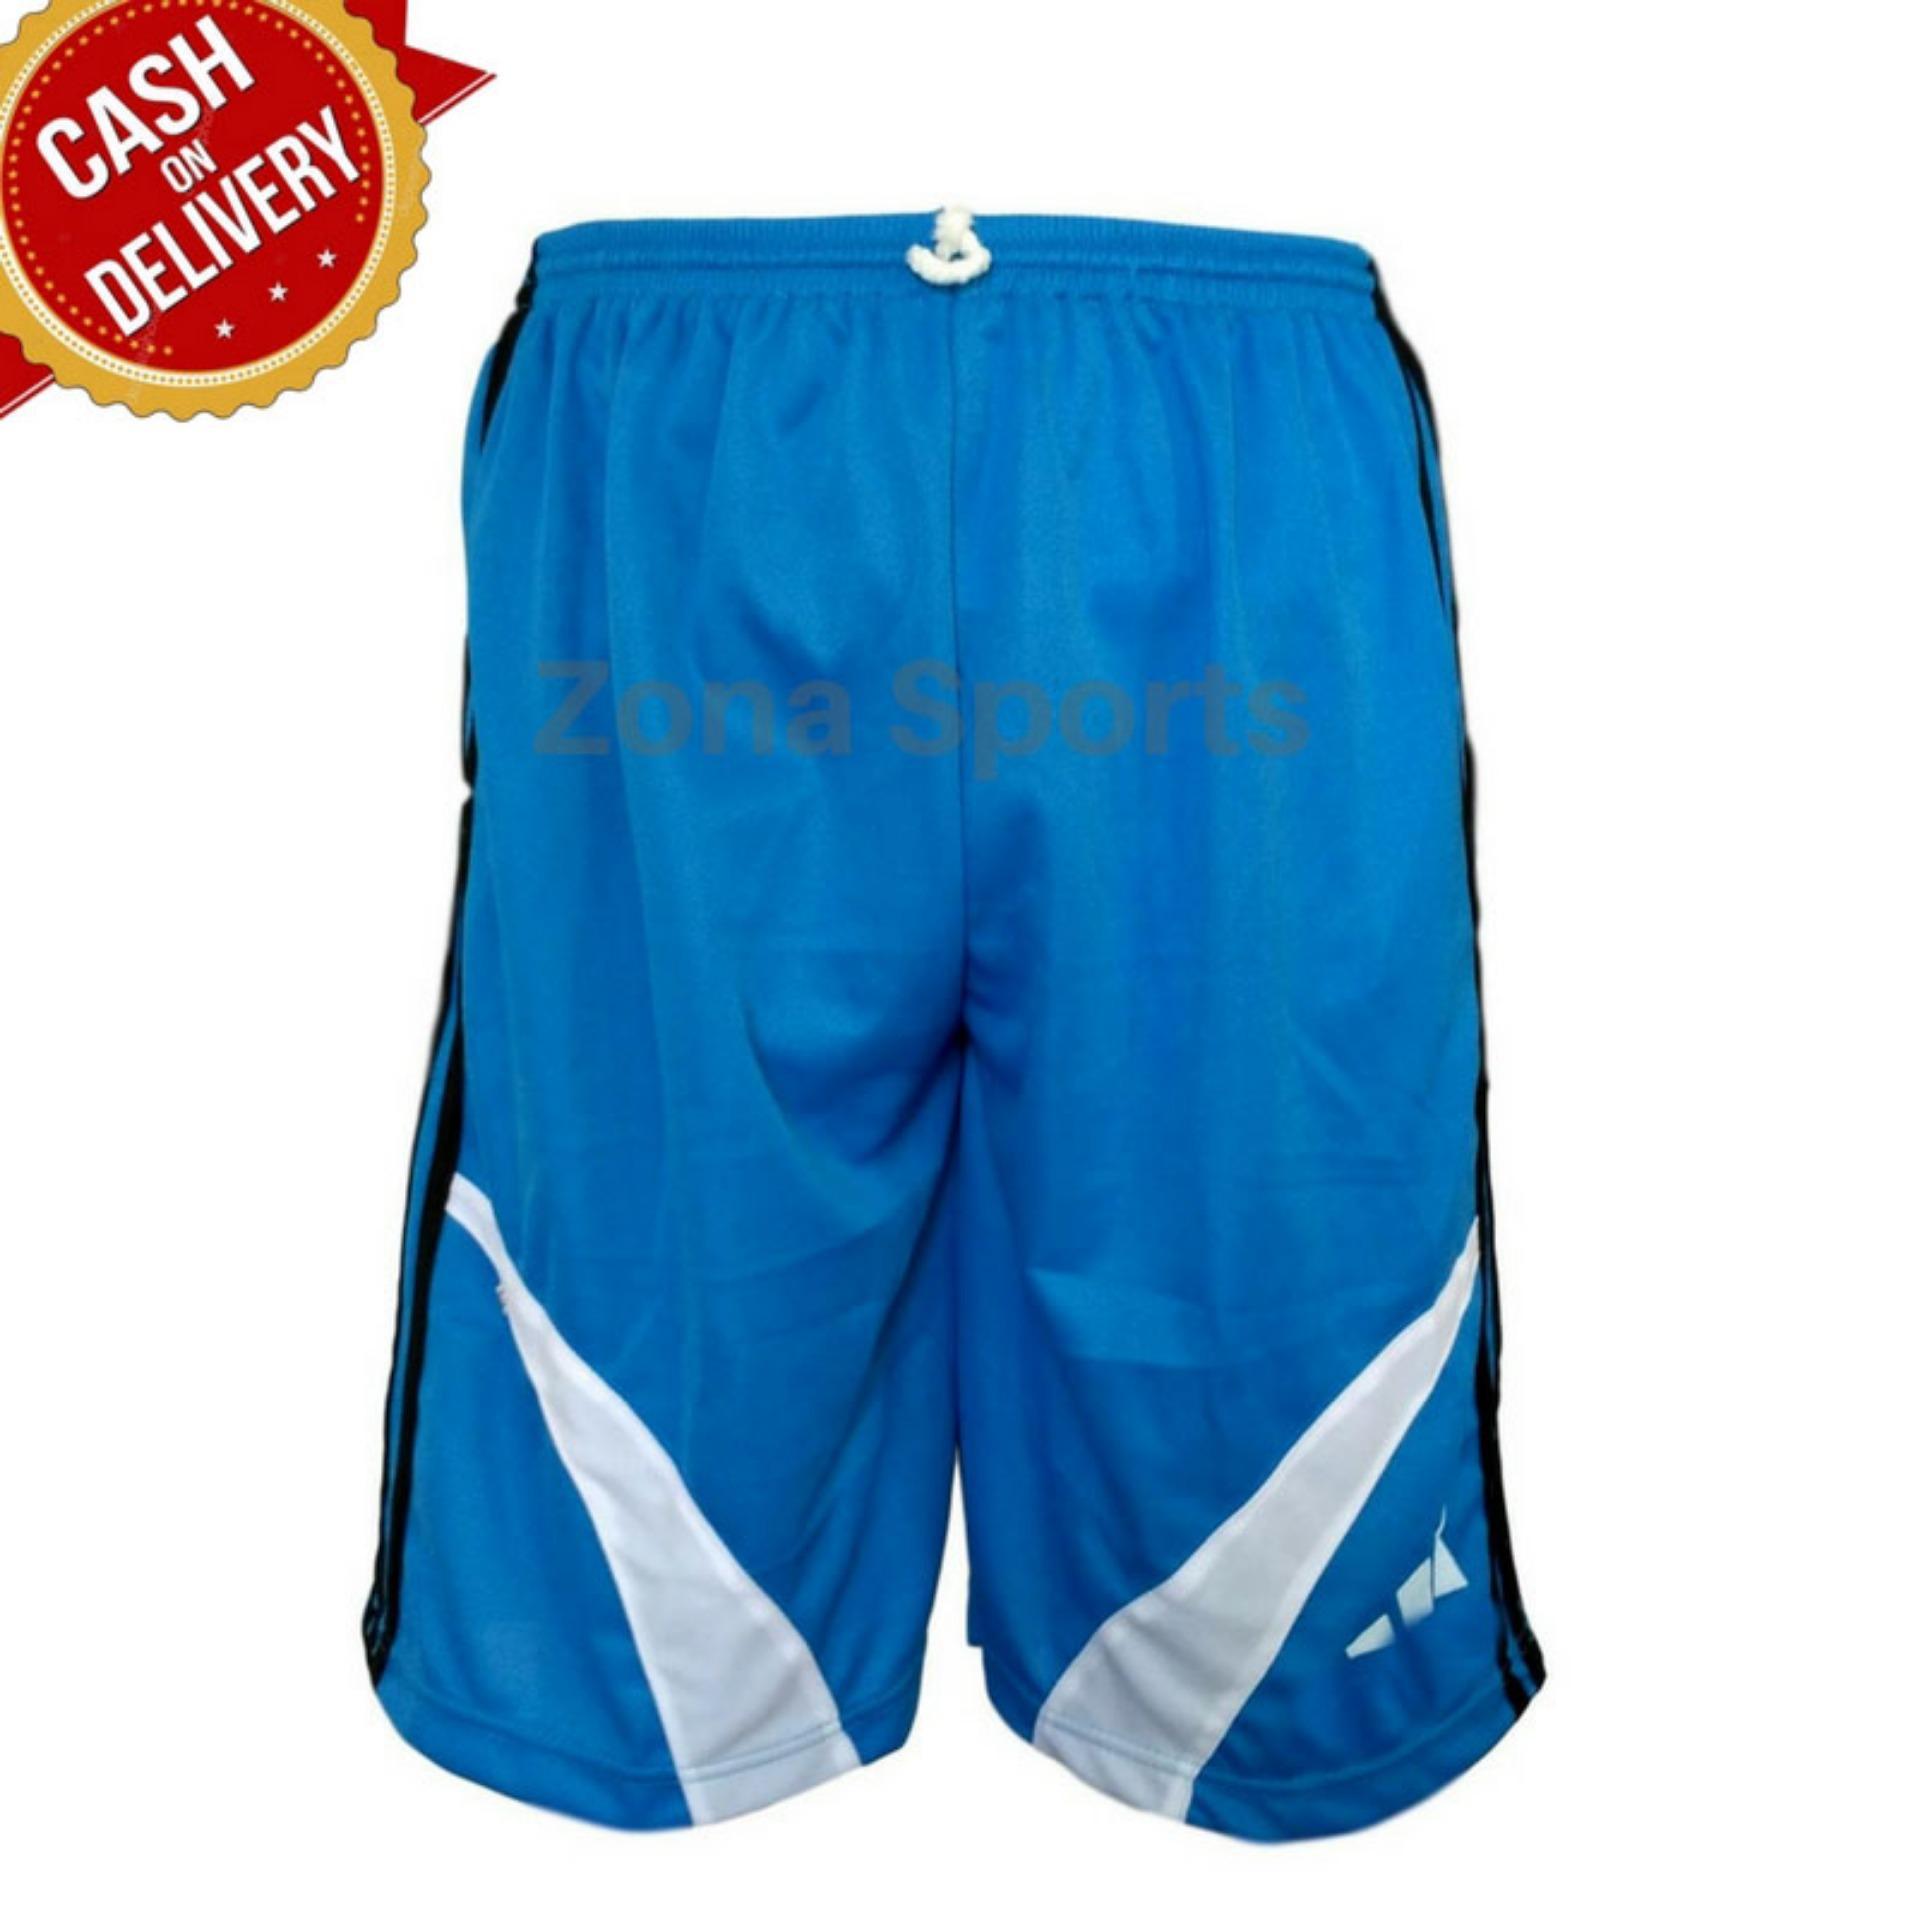 Harga Celana Pendek Olahraga Pria Termurah November 2018 Bahan Bagus Kolor Nyaman Dipakai Zona Sports Outdoor Training Joging Futsal Sepakbola Fitness Gym